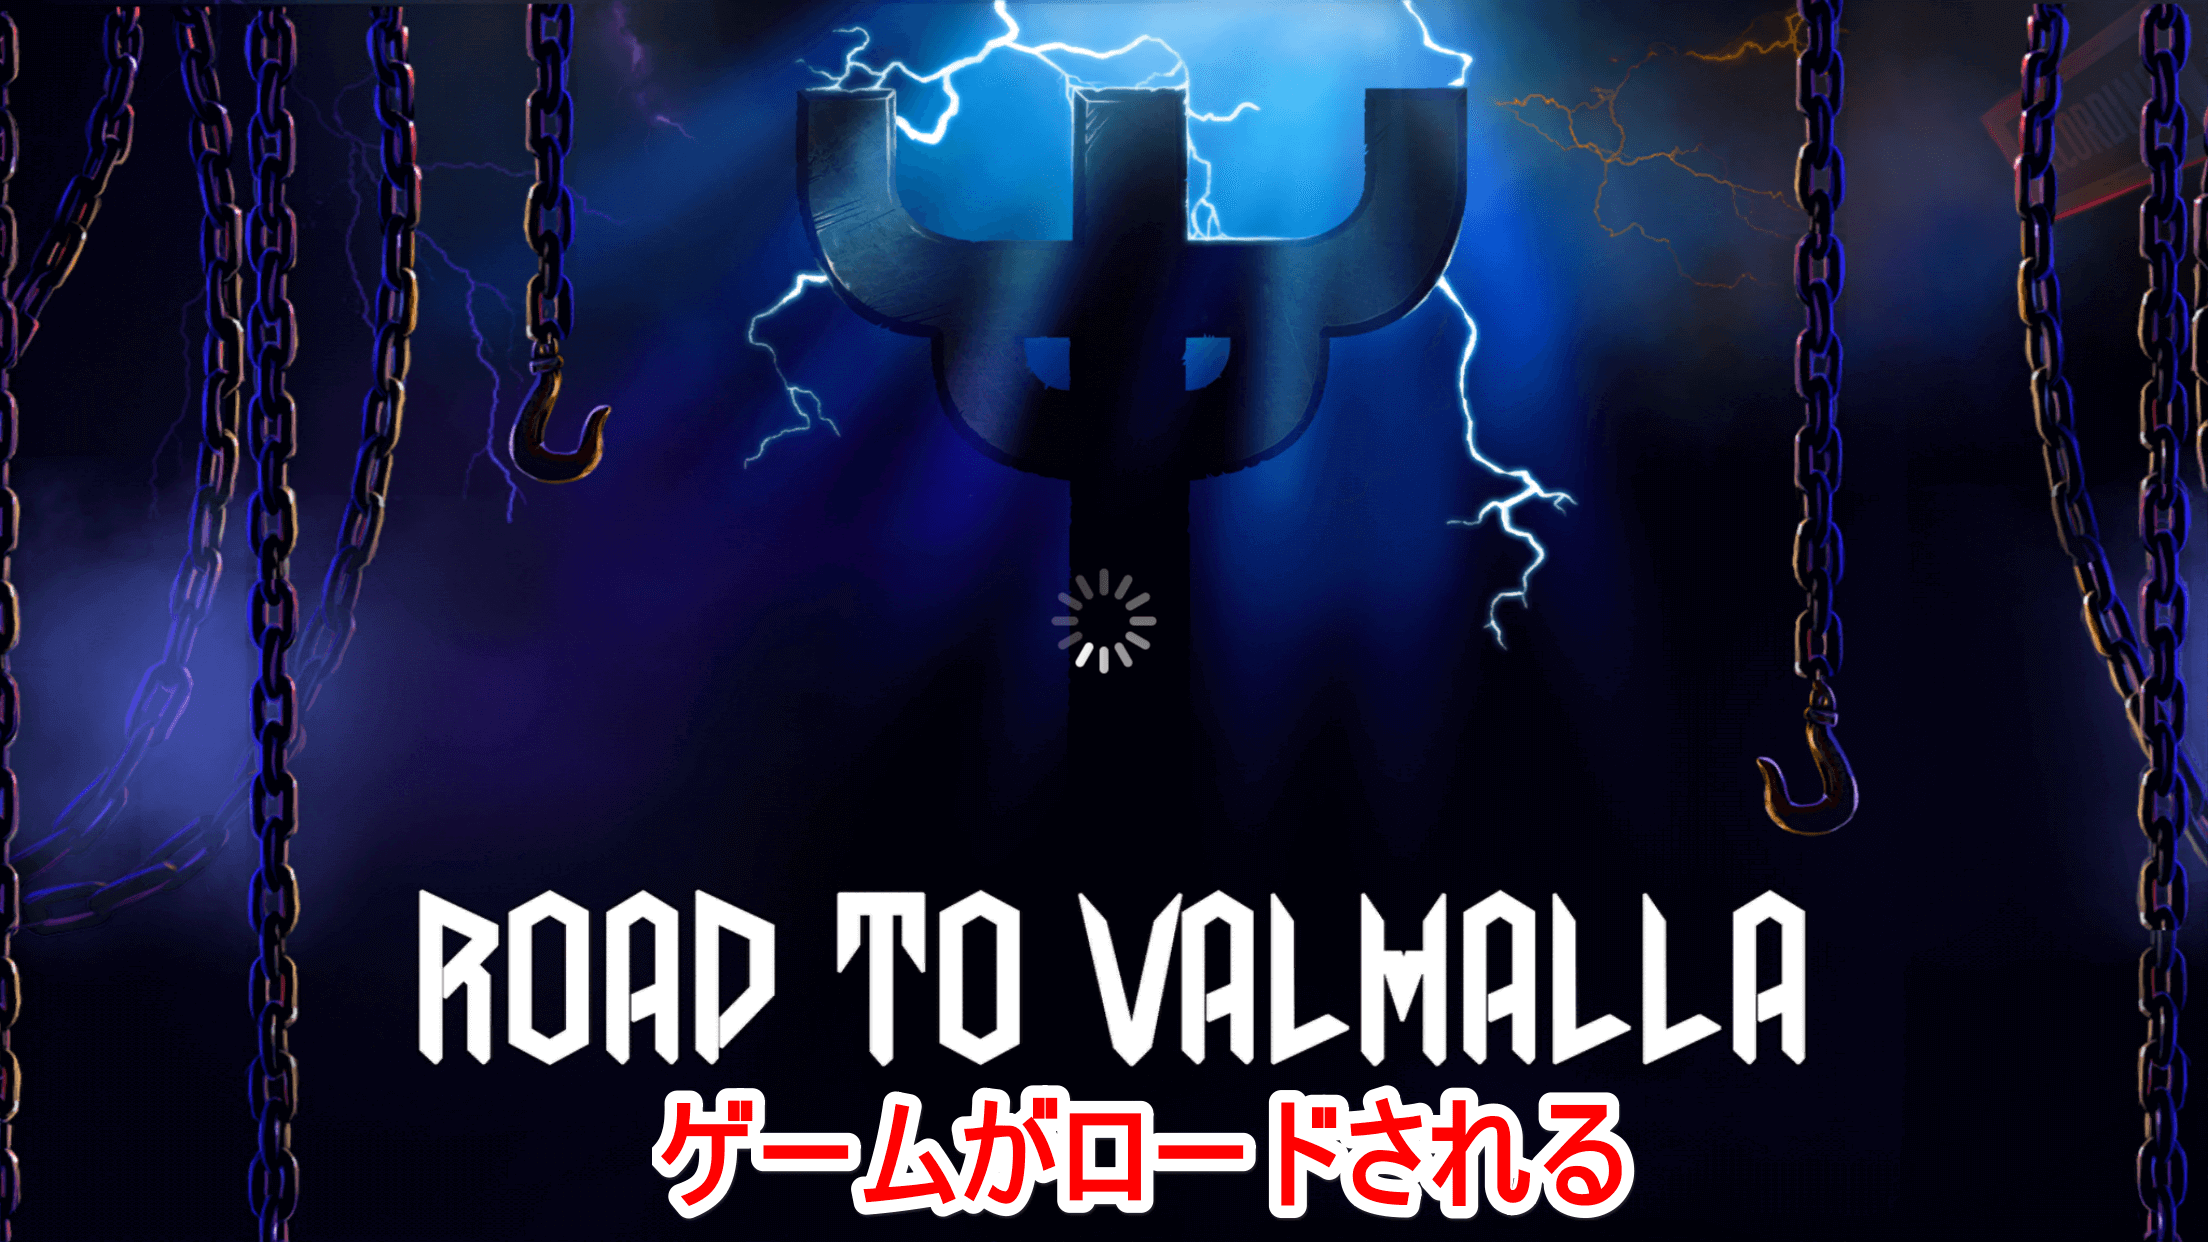 Judas Priest(ジューダス・プリースト)の[Road to Valhalla]アプリの起動画面